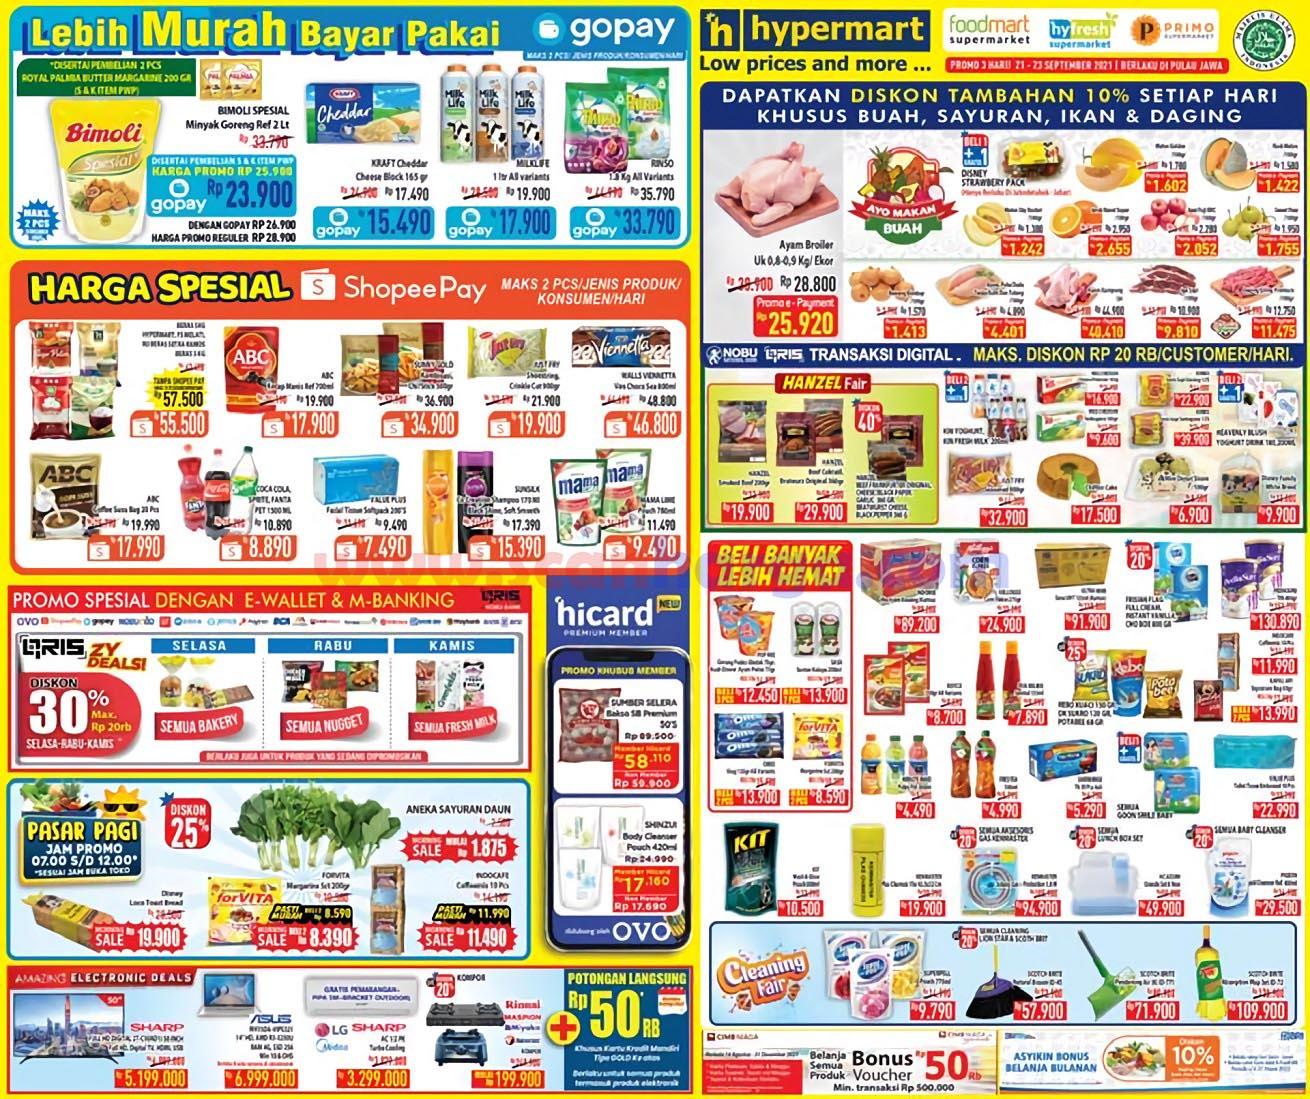 Katalog Promo Hypermart Weekday Terbaru 21 - 23 September 2021 1